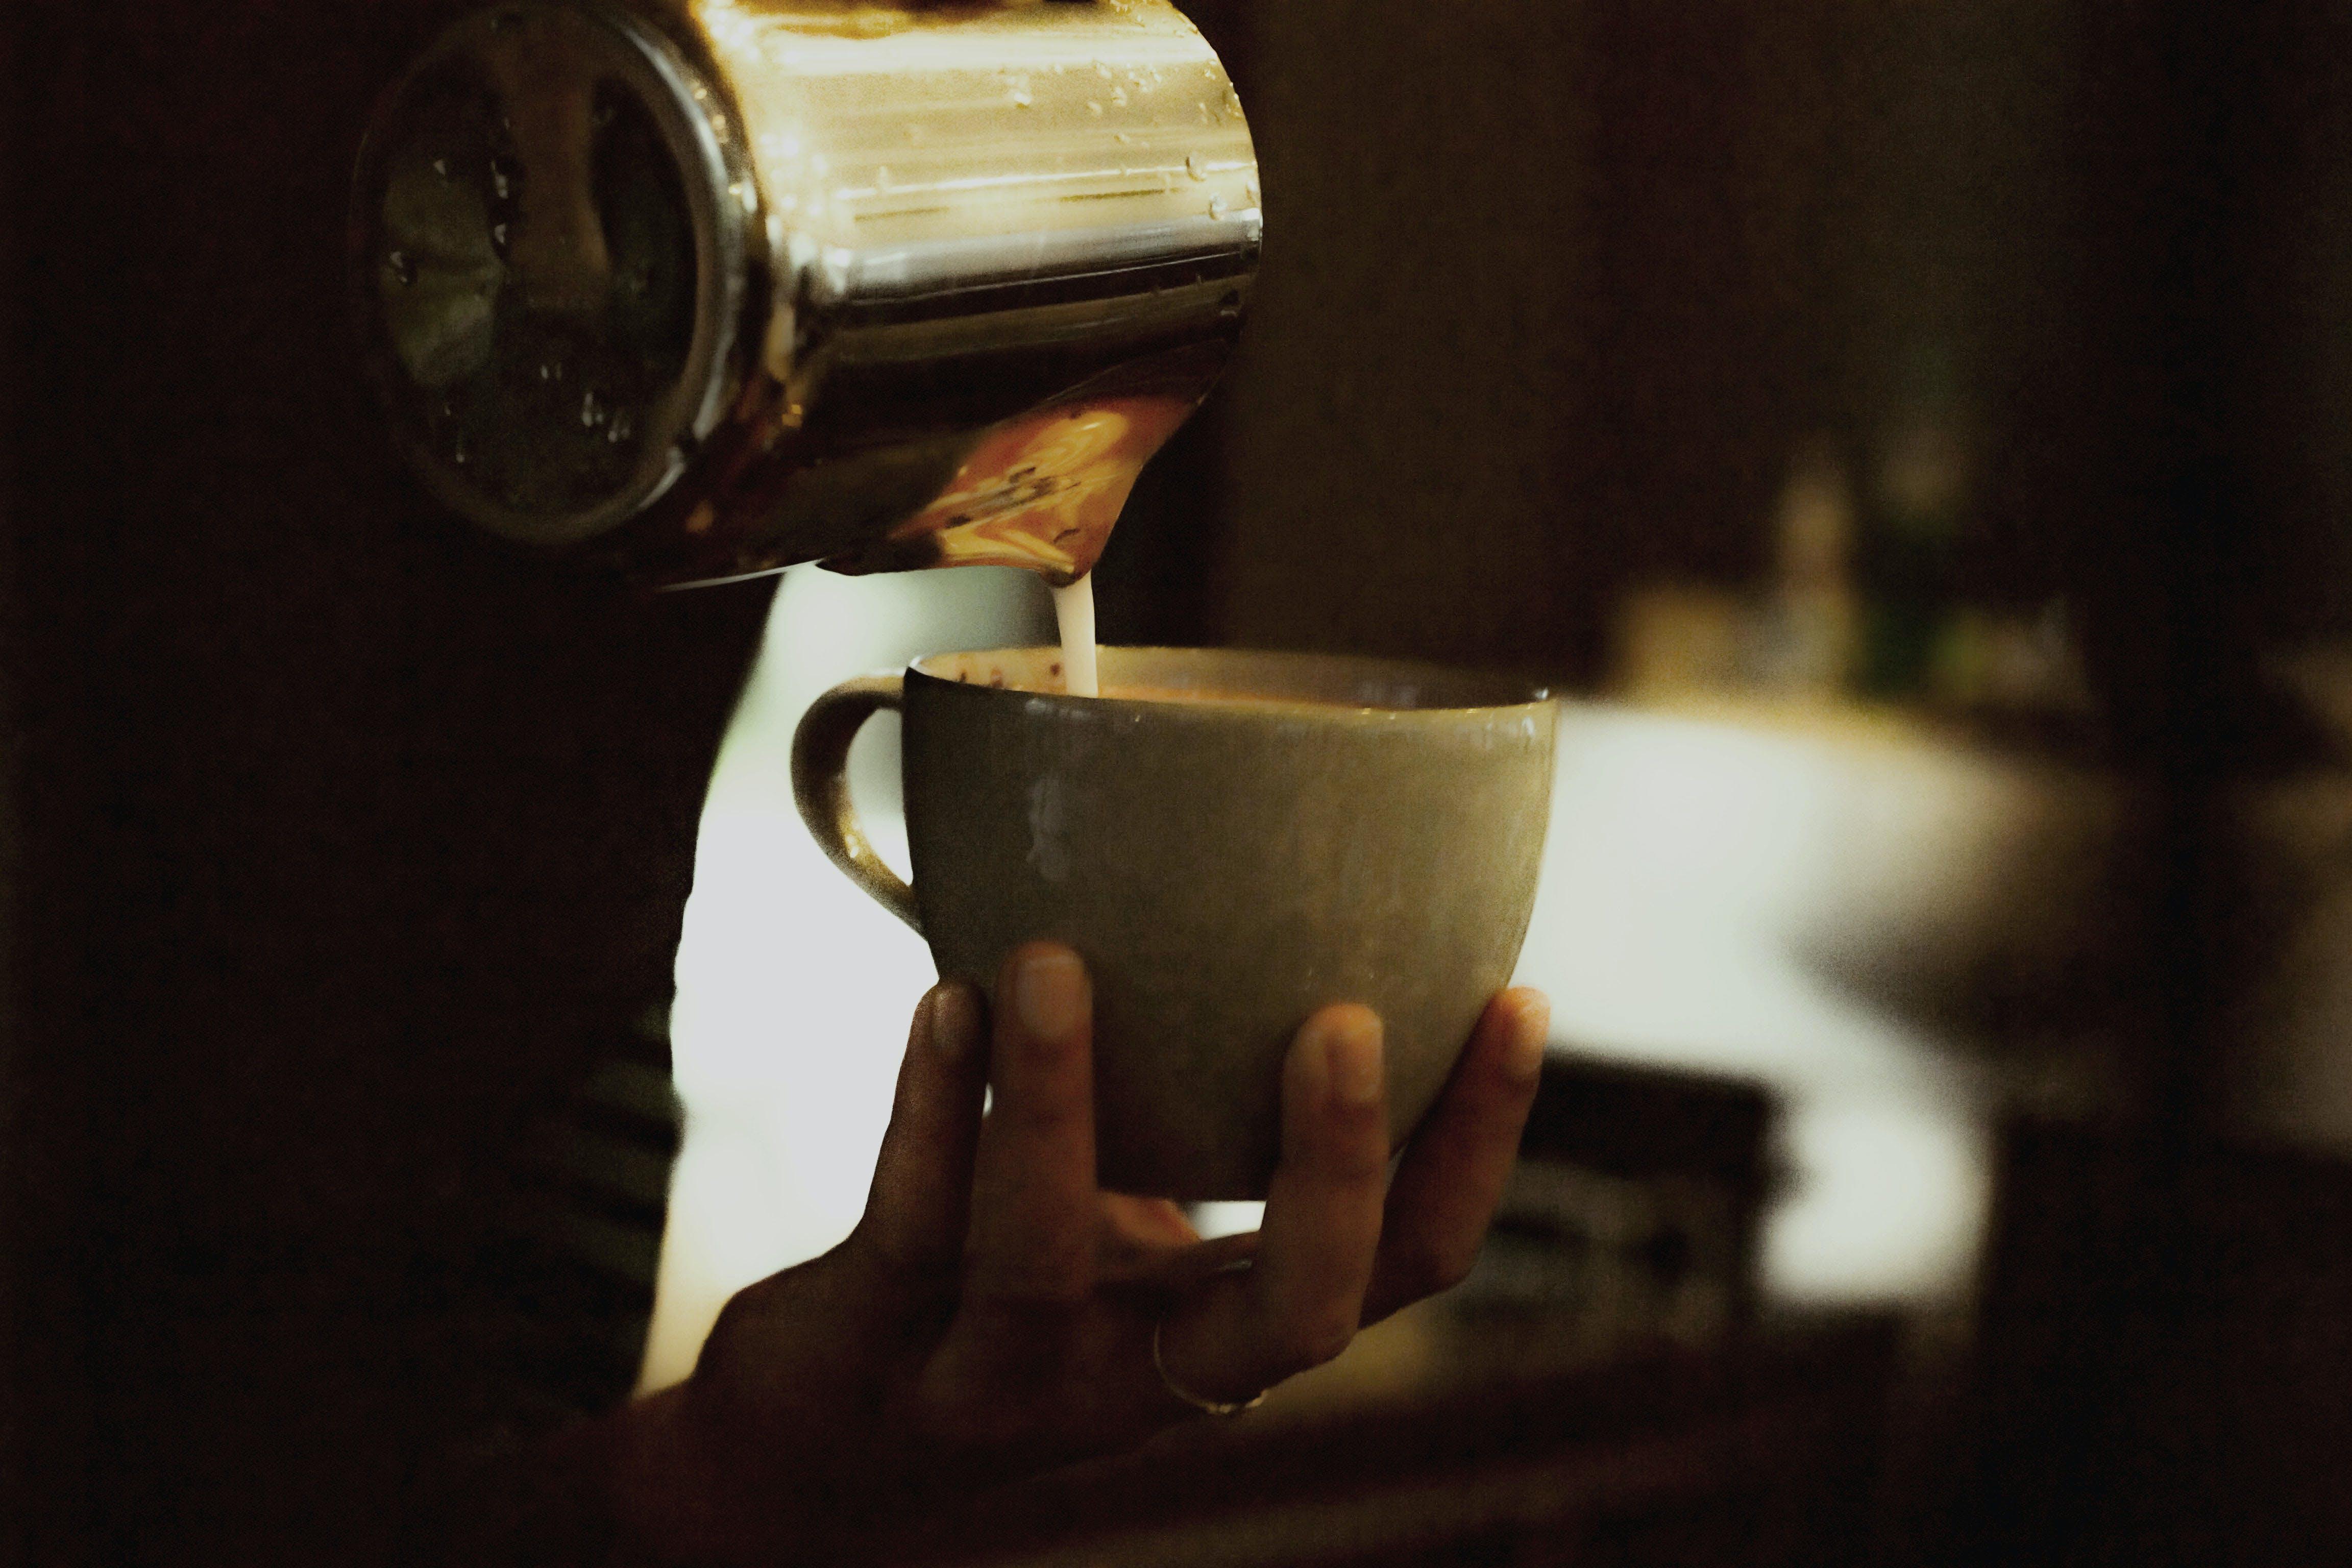 Gratis stockfoto met barista, cafeïne, container, drank